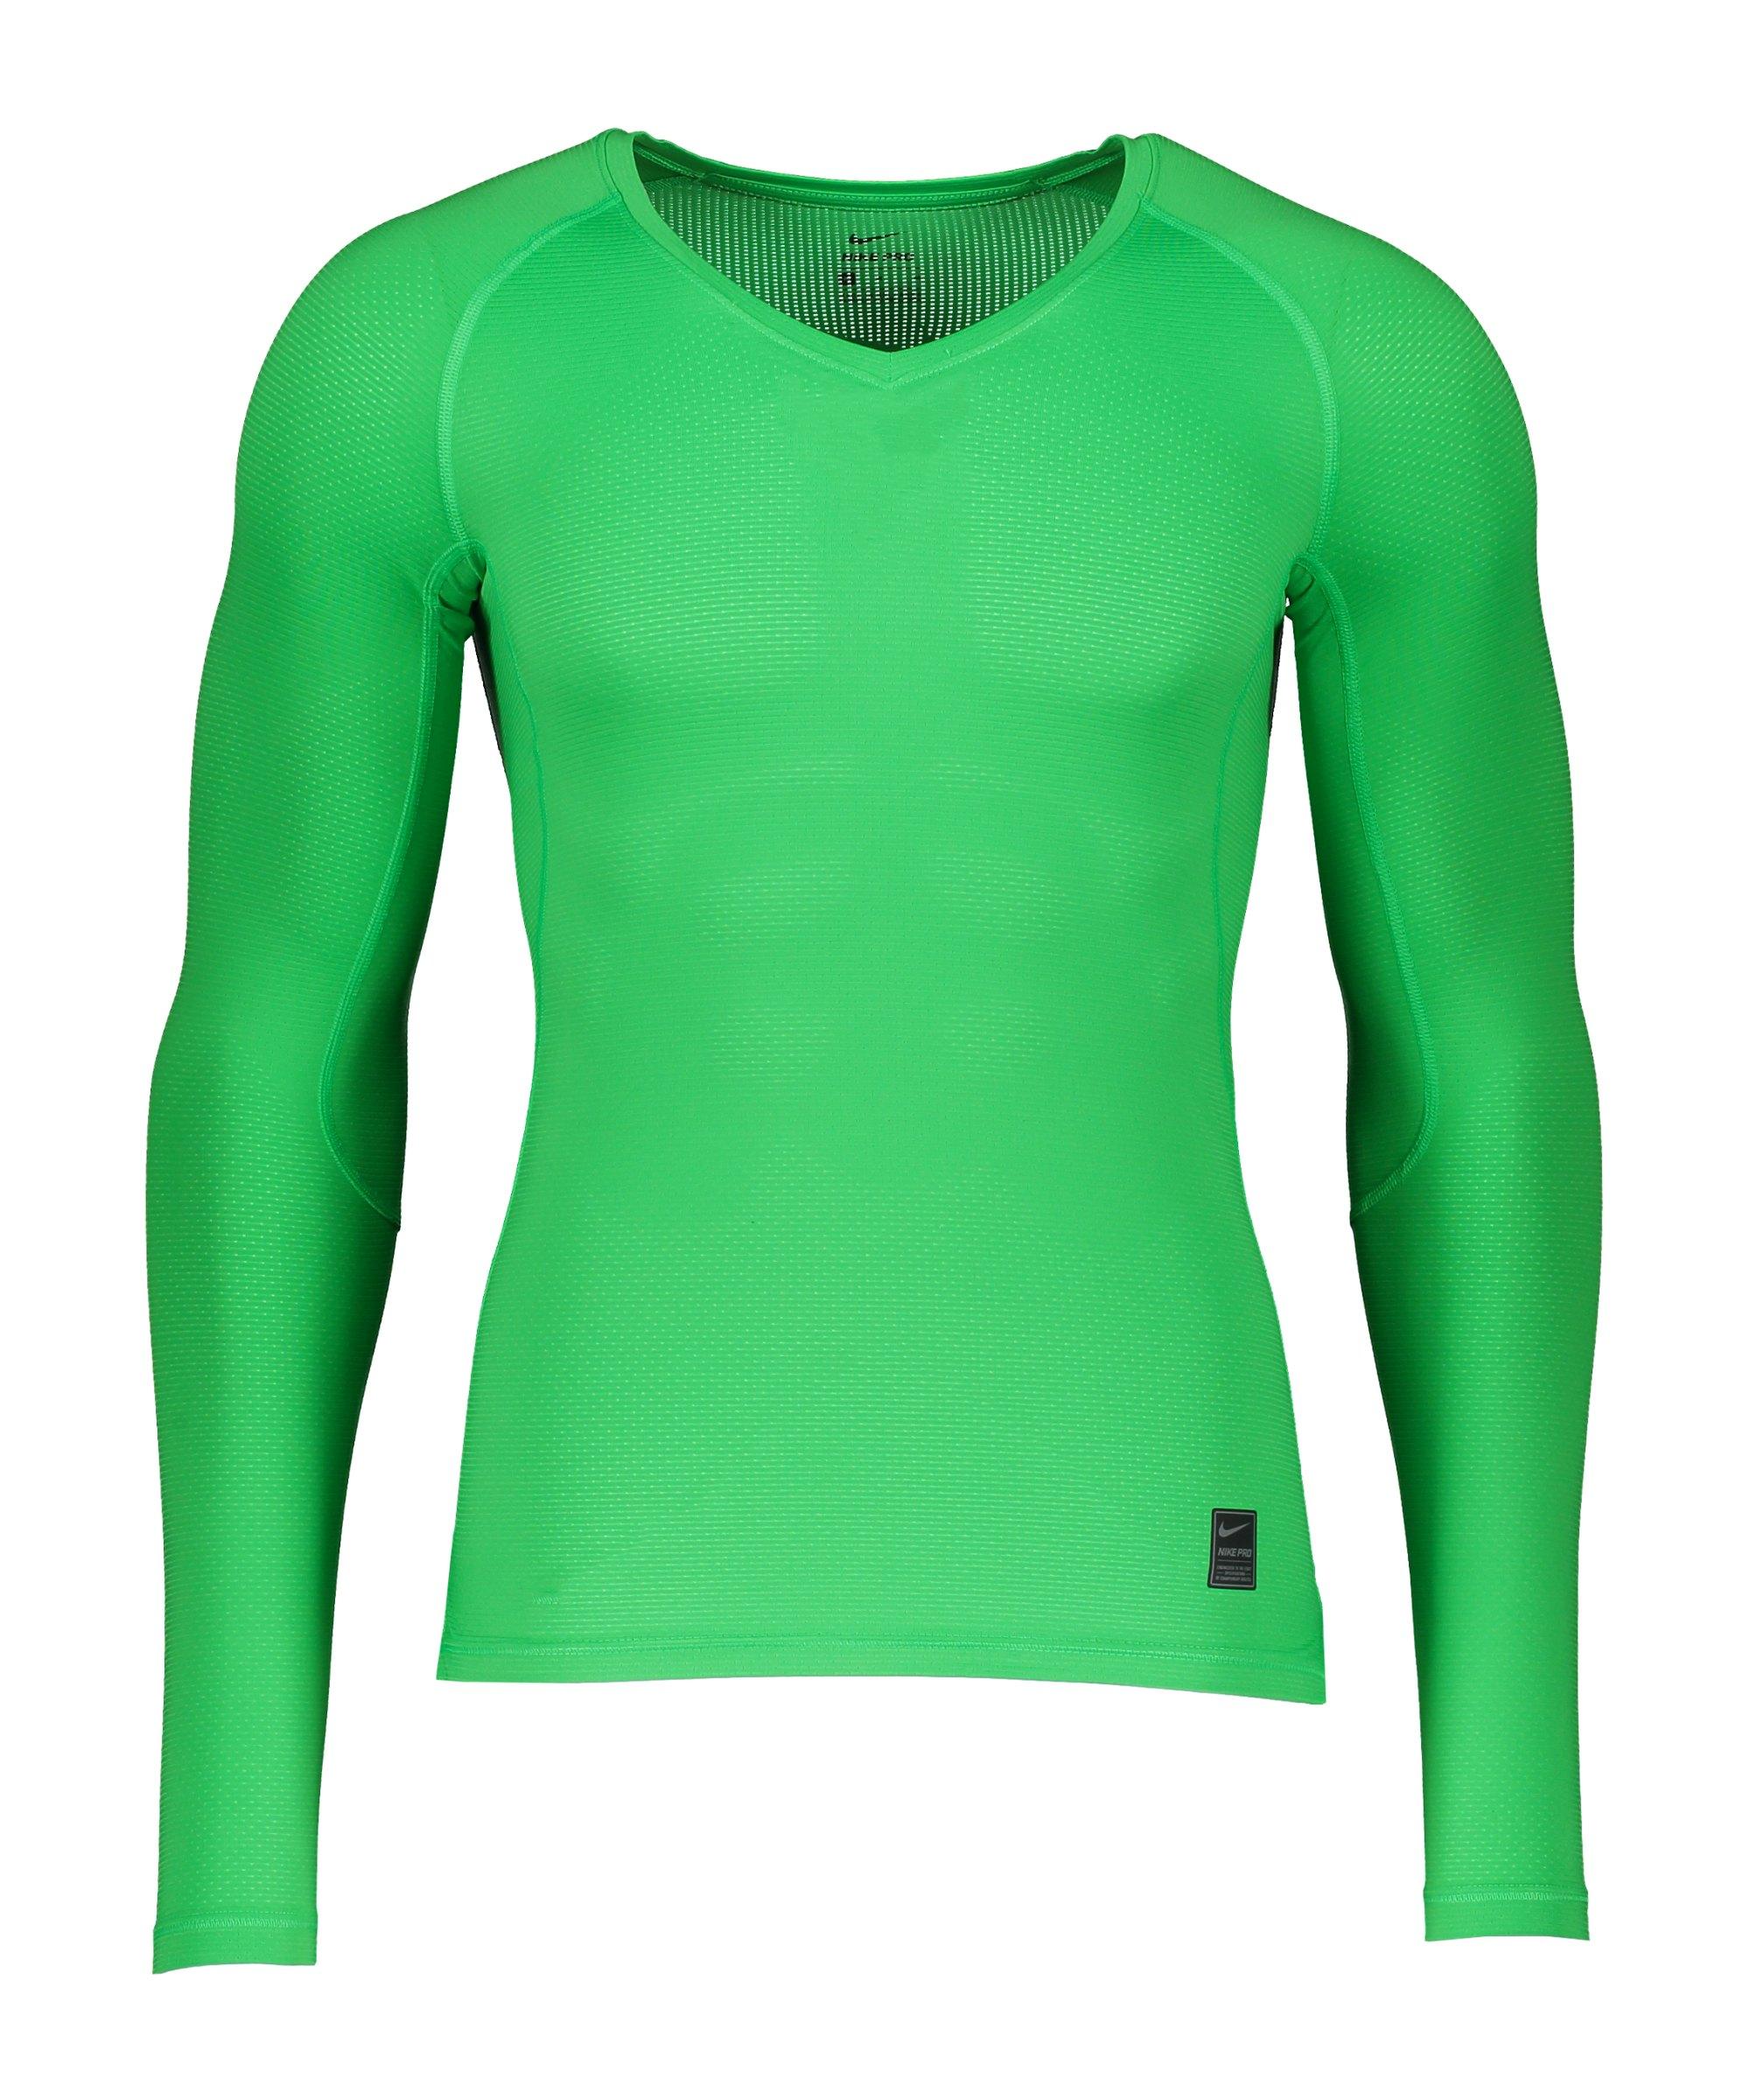 Nike Pro Hypercool Comp Shirt langarm Grün F329 - gruen